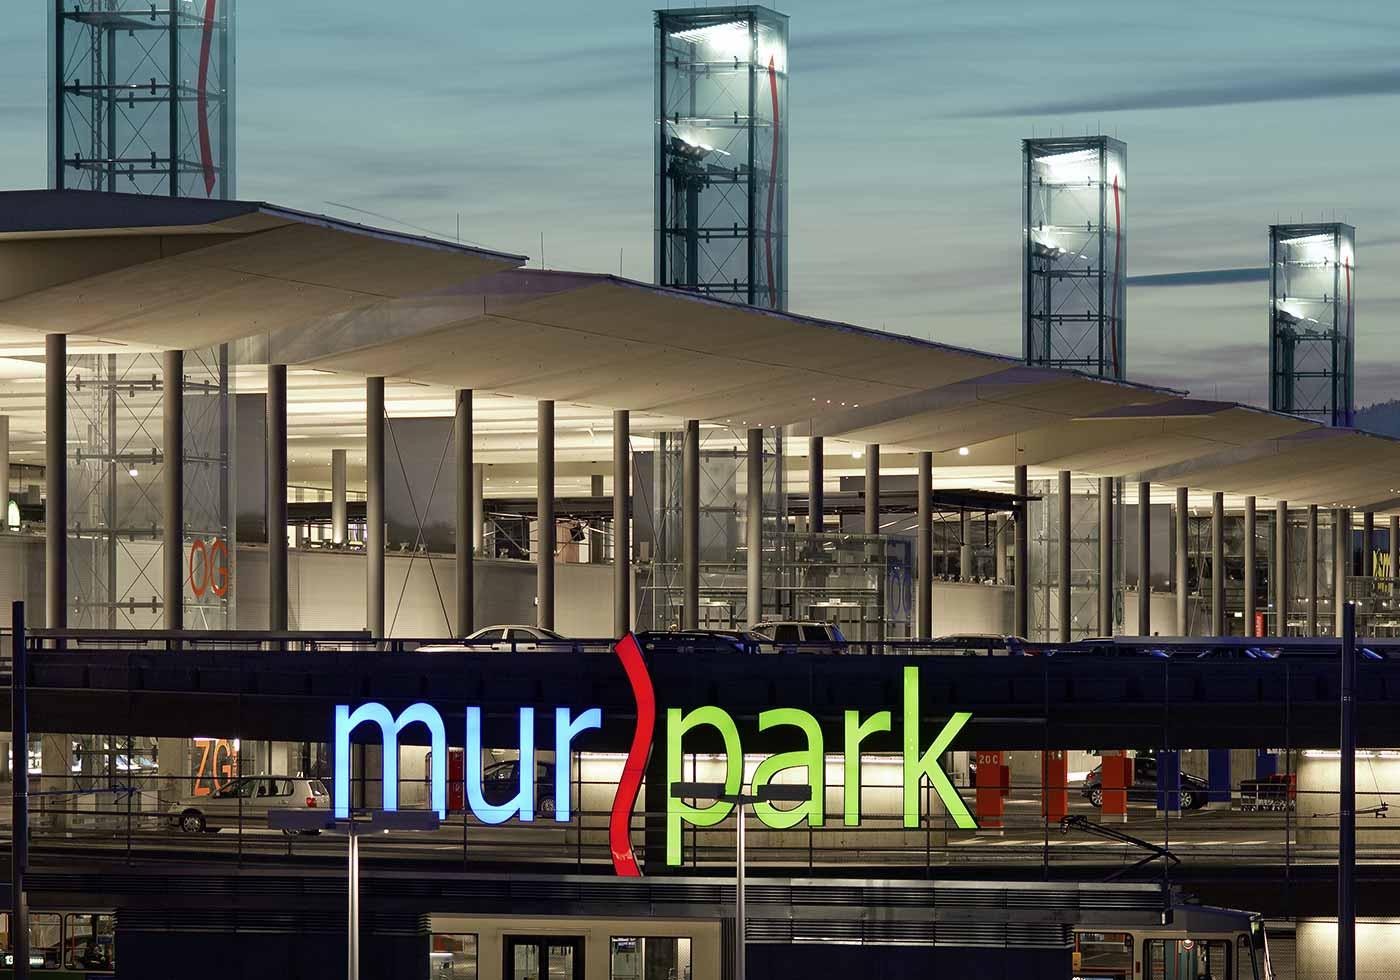 Торговая галерея Murpark, Грац, Австрия